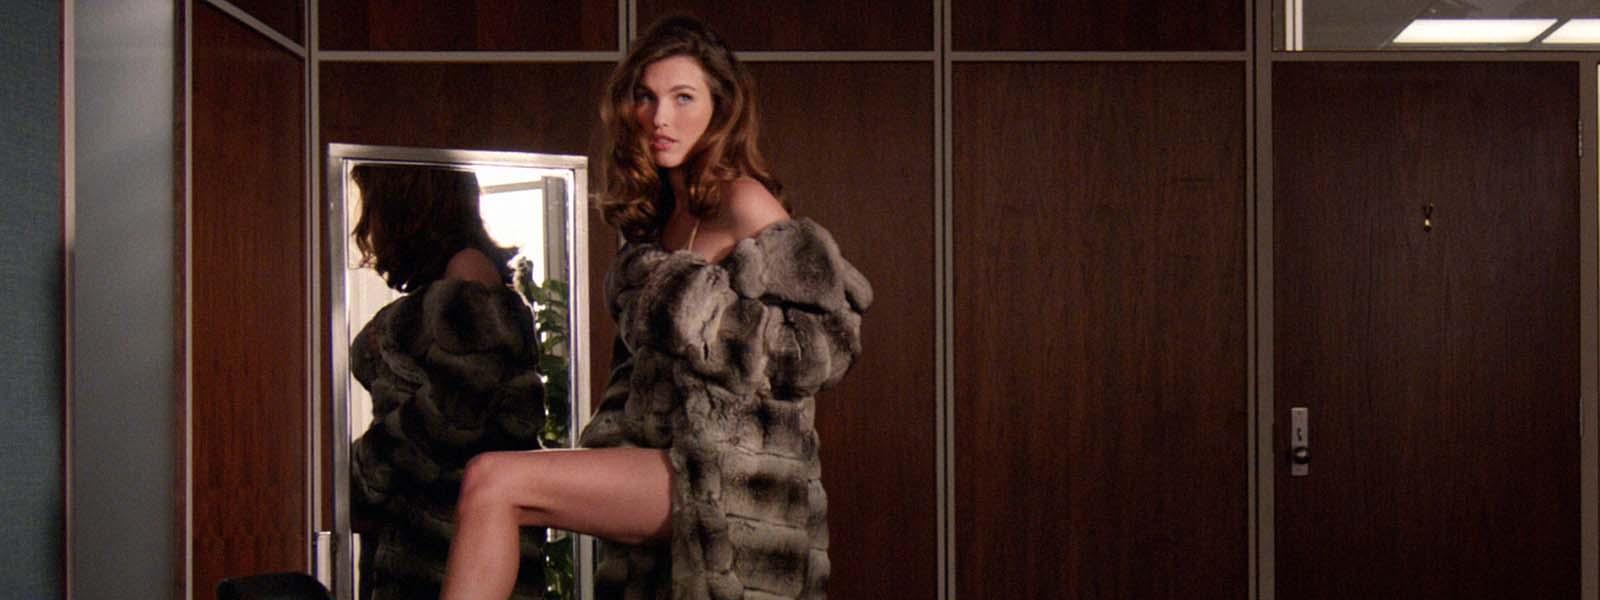 The <em>Mad Men</em> Fashion File, Episode 708 &#8211; Mirror, Mirror